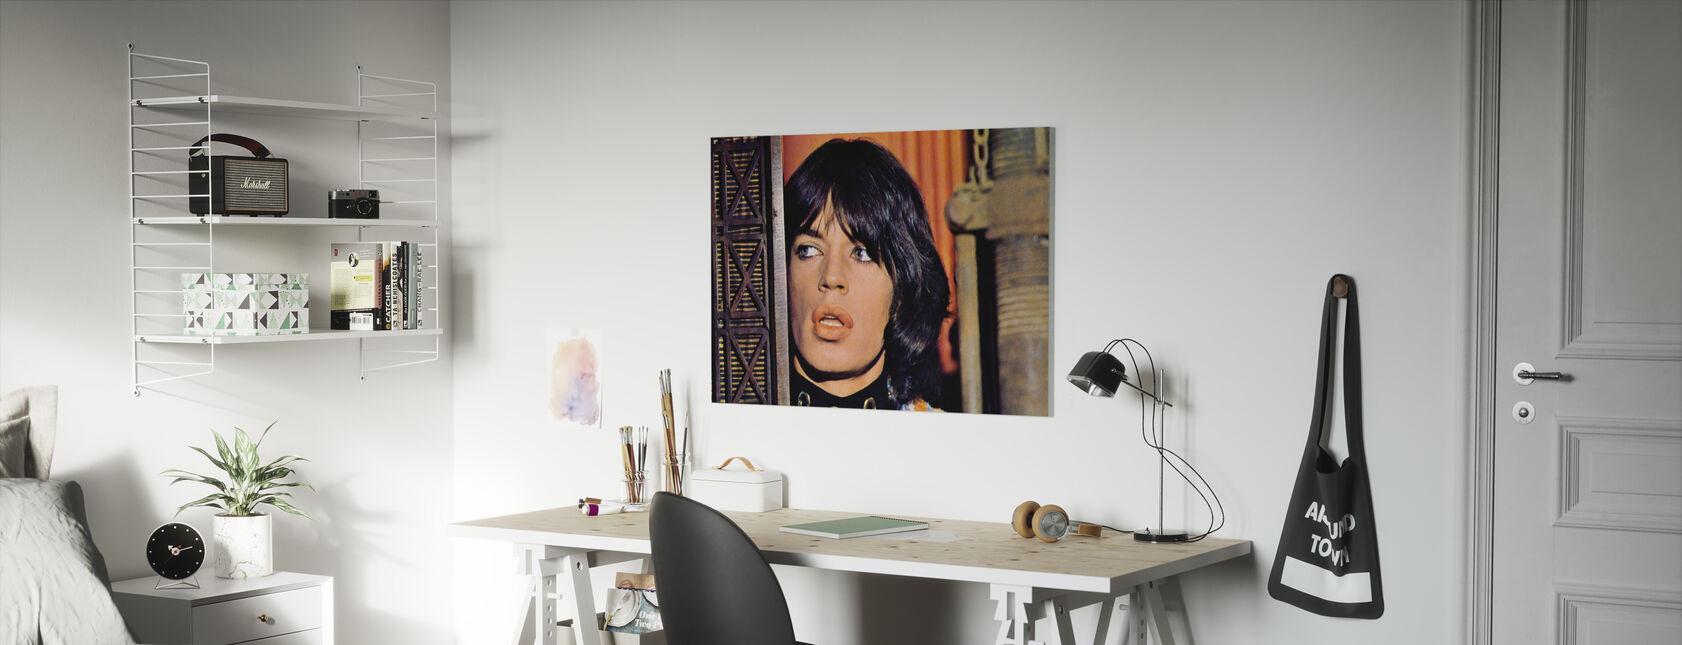 Prestaties 1970 - Canvas print - Kinderkamer